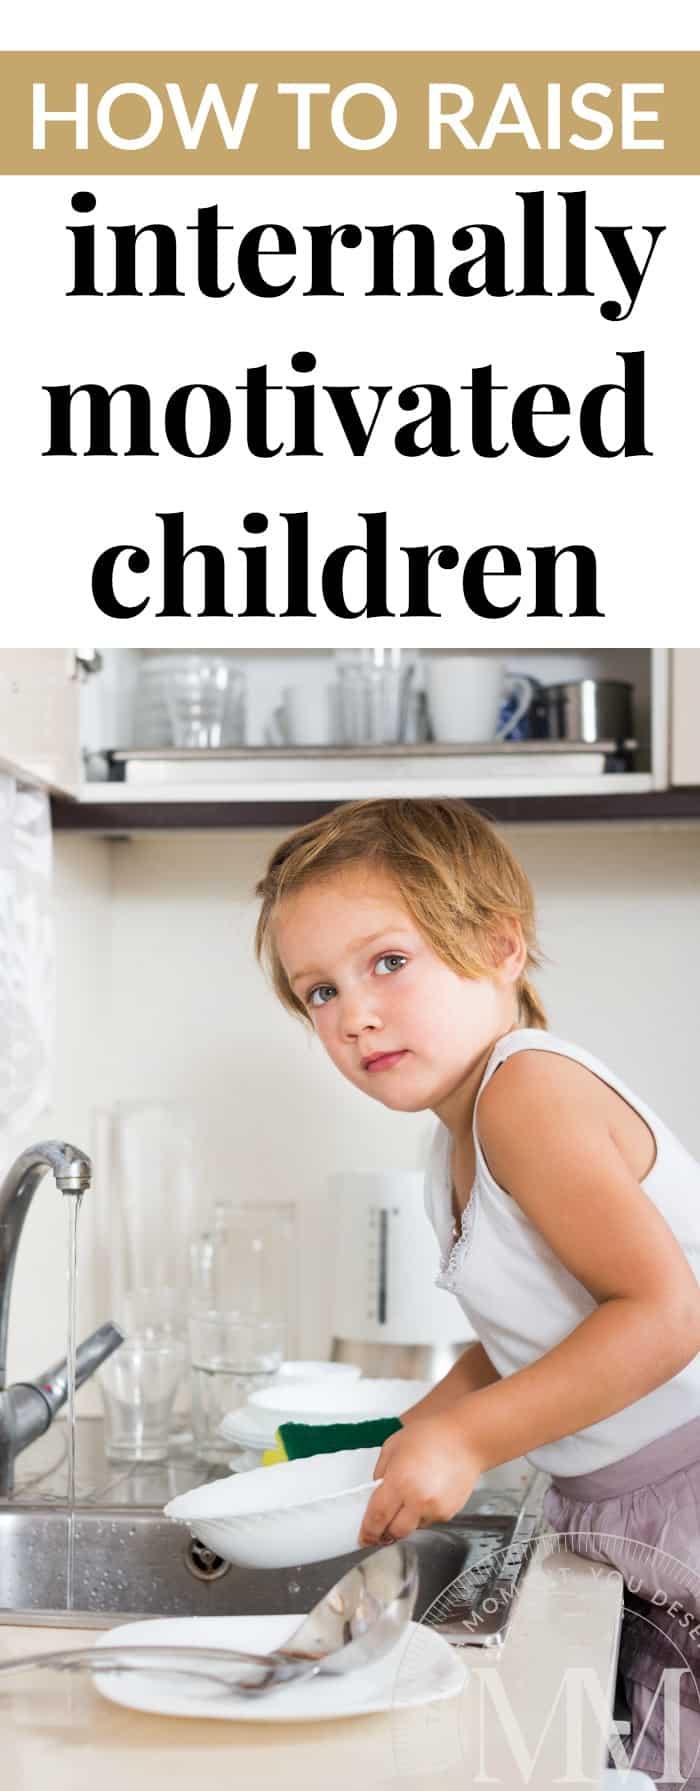 internally motivated children